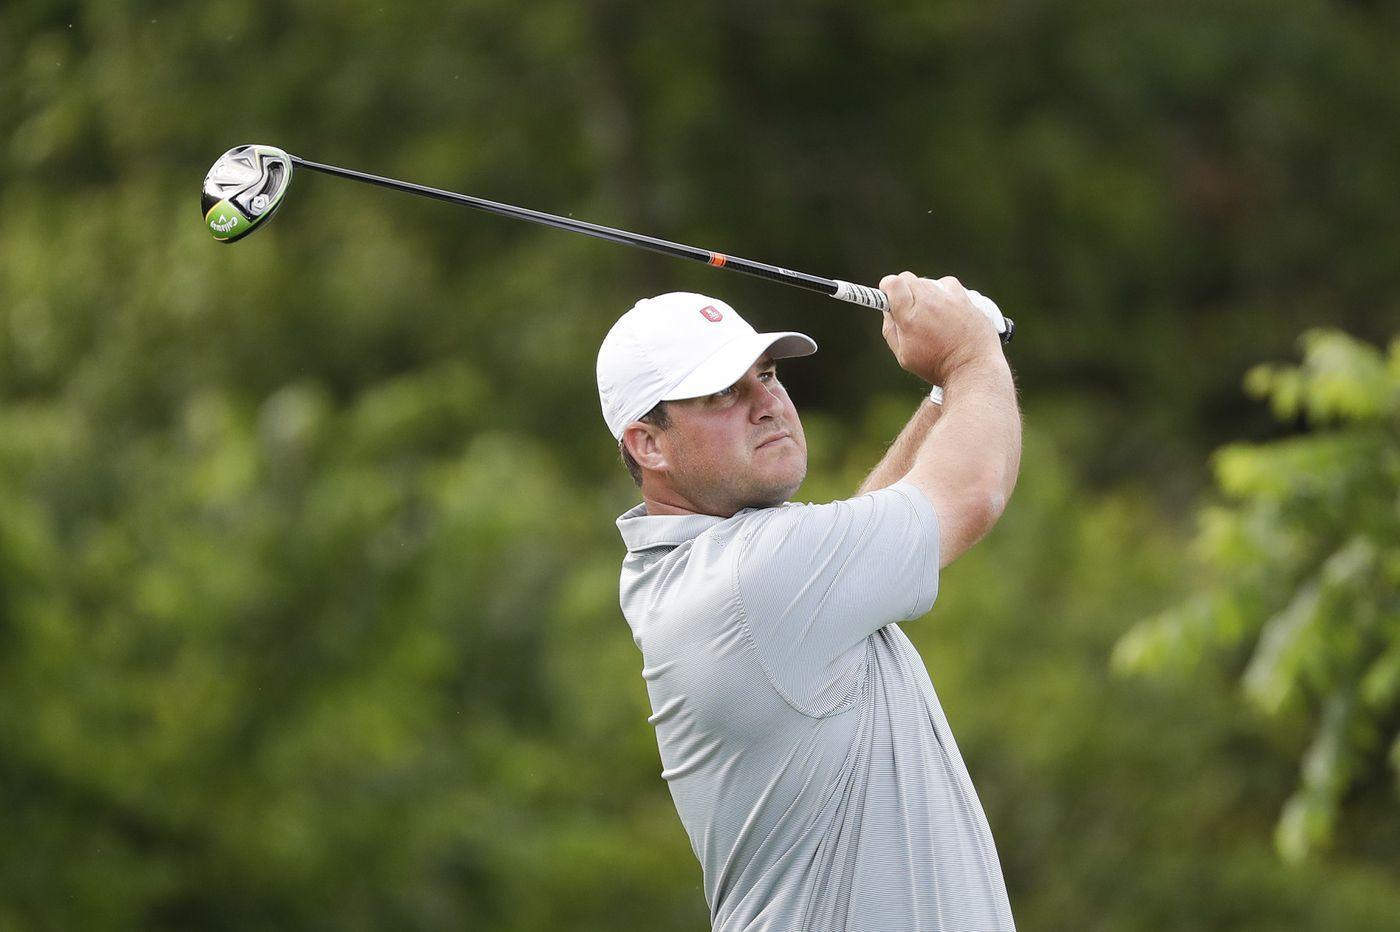 Jeff Osberg completes Golf Association of Philadelphia career Grand Slam, wins GAP Middle-Amateur